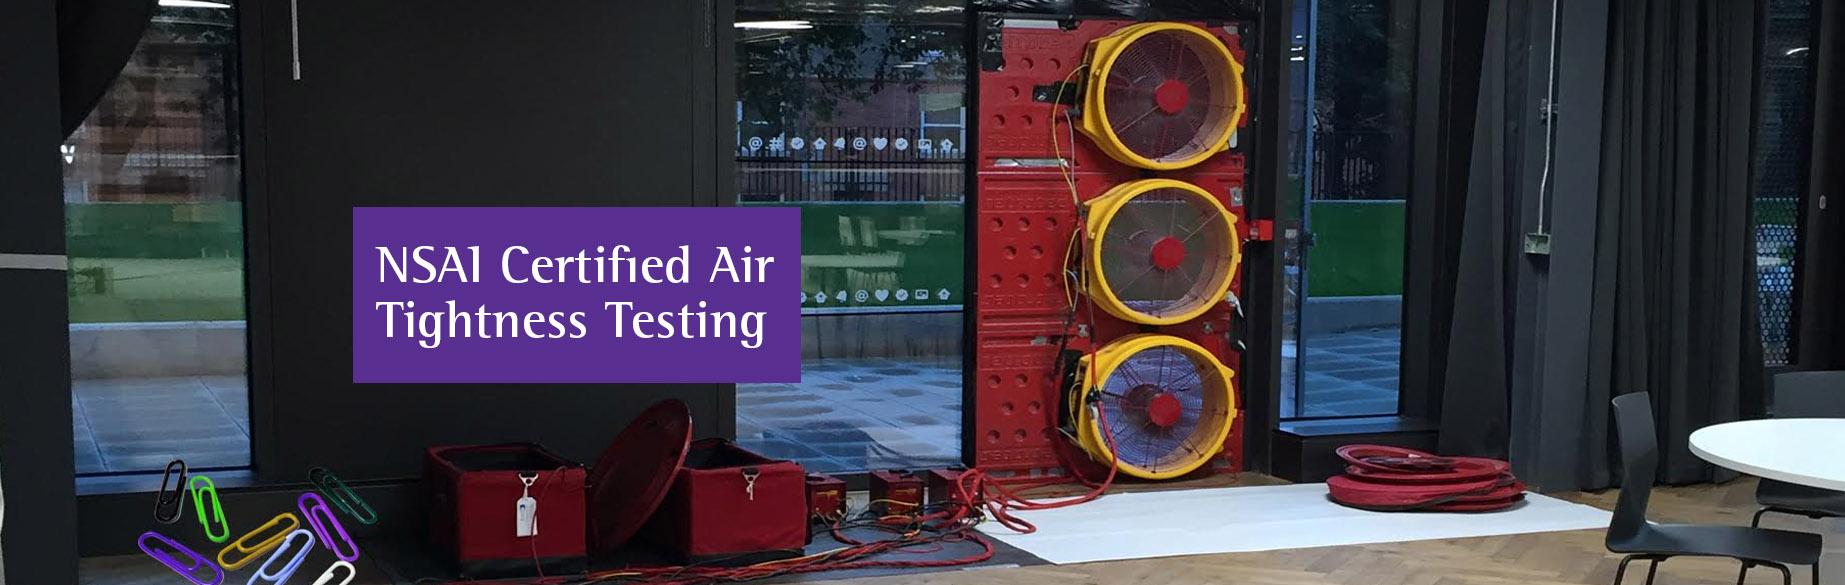 Evolve Energy - Certified Air Tightness Testing